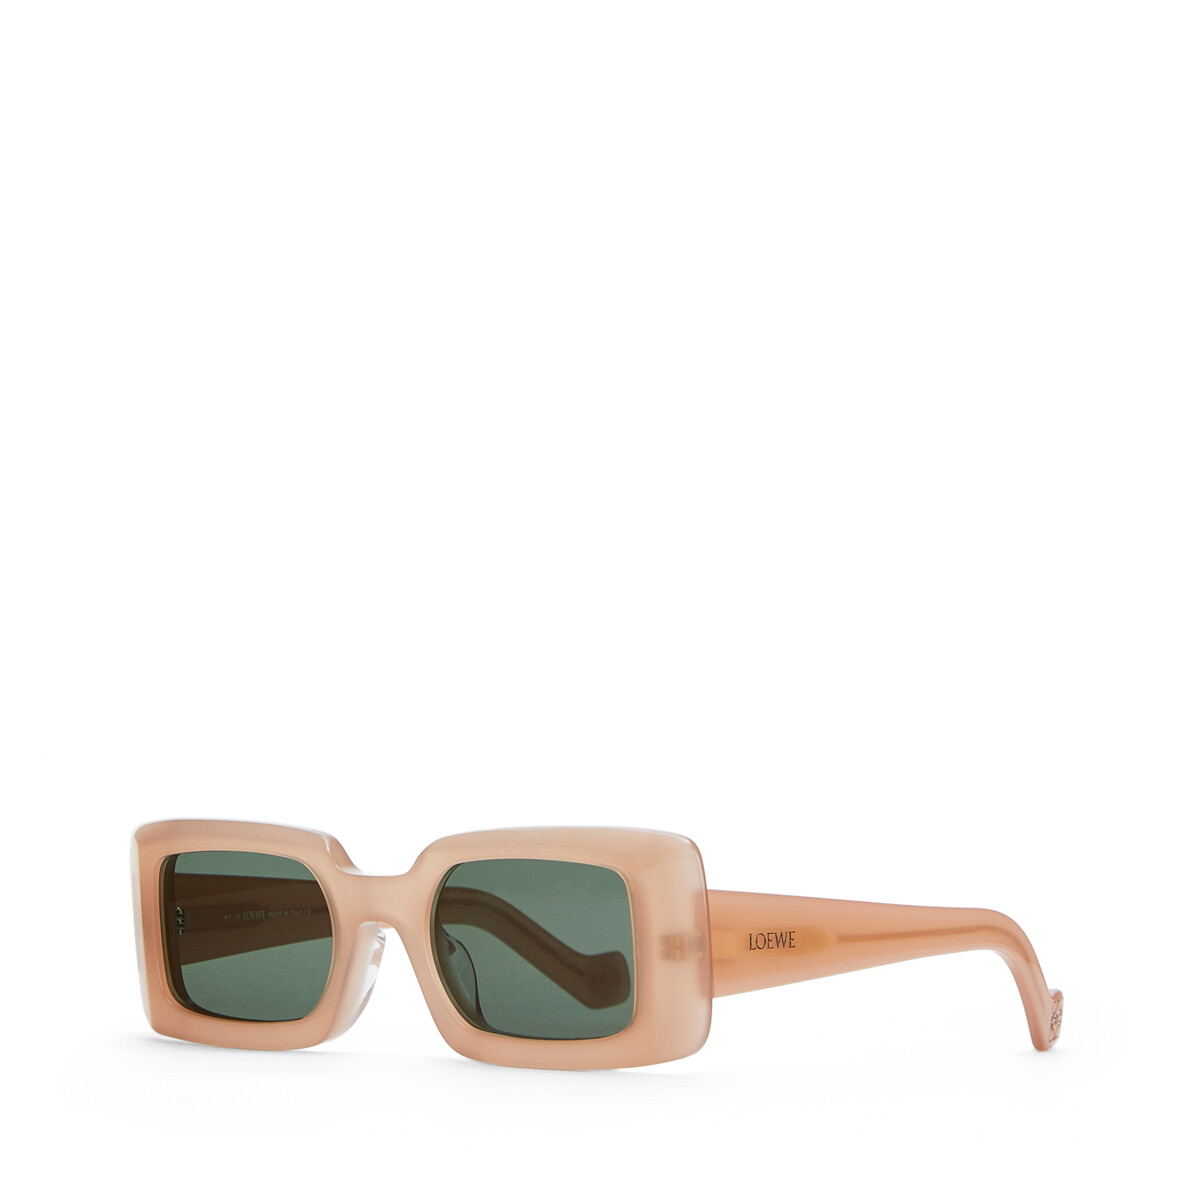 LOEWE Acetate Square Sunglasses Pink/Green Smoke front